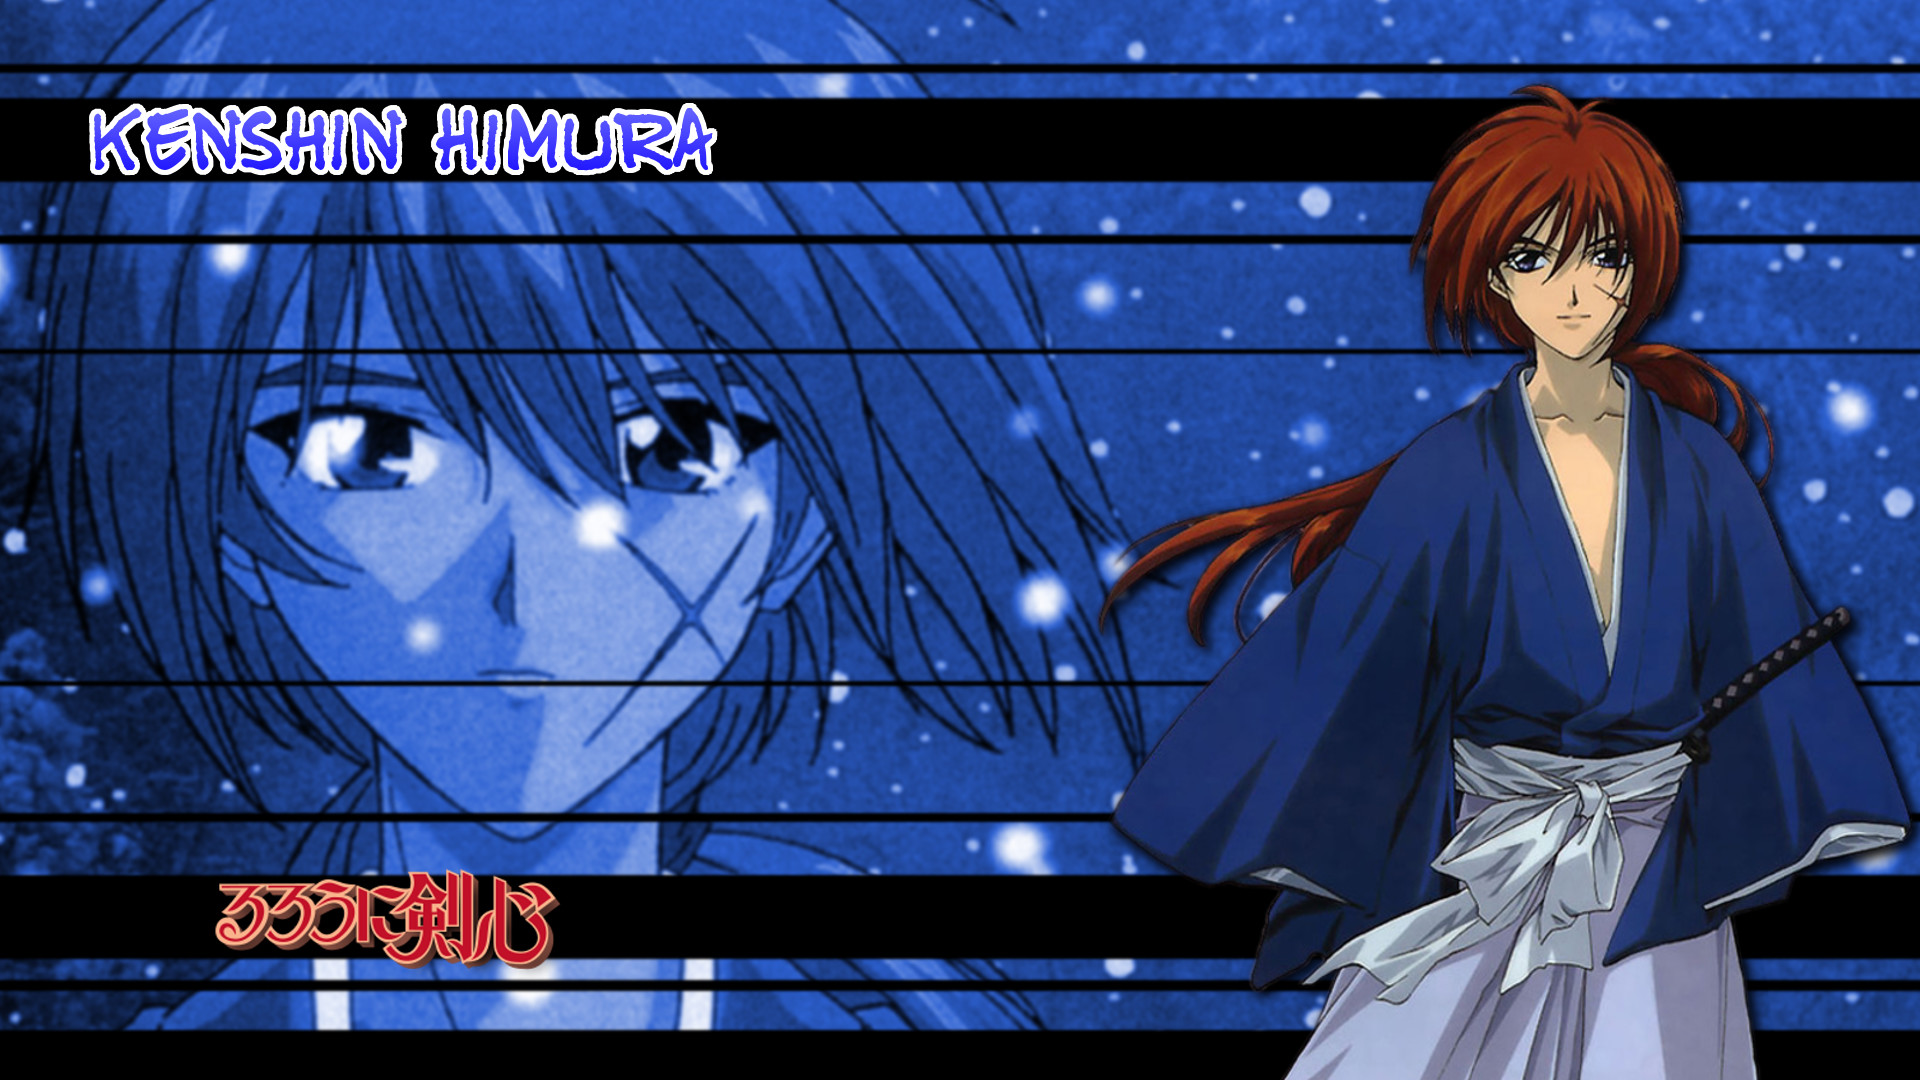 Rurouni Kenshin Kenshin Himura 01 by NekoTheOtaku Rurouni Kenshin Kenshin  Himura 01 by NekoTheOtaku